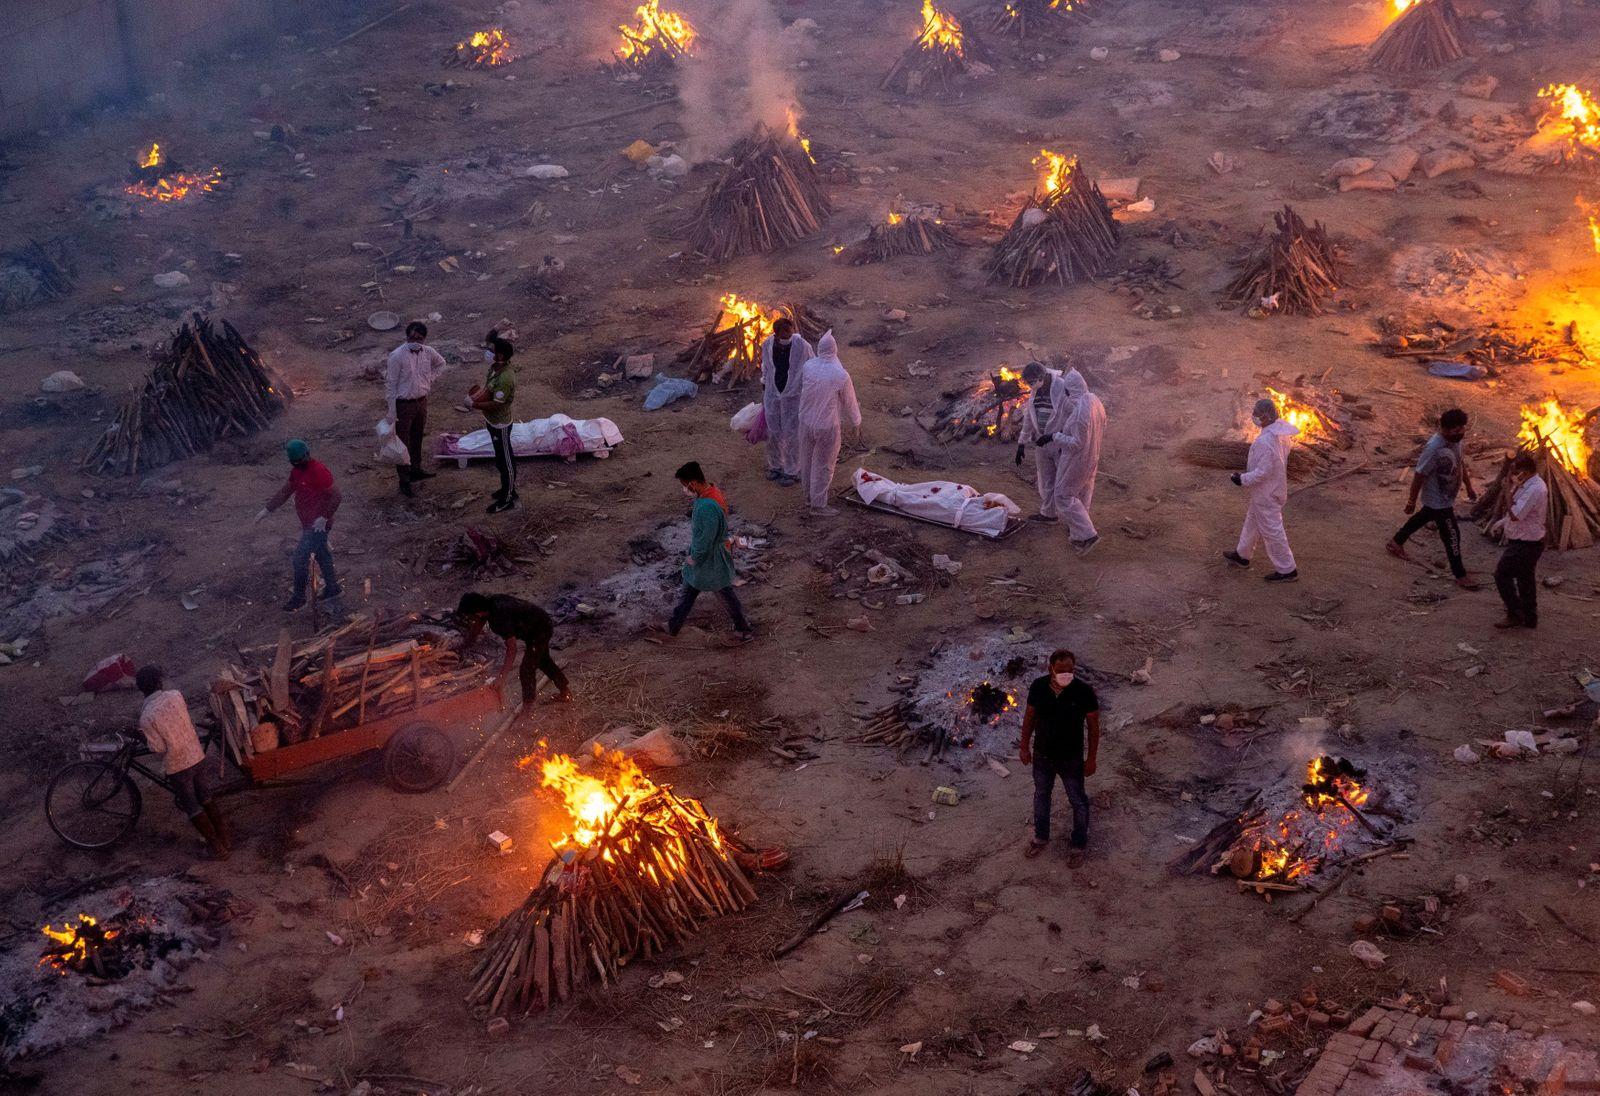 People wait to cremate COVID-19 victims at a crematorium ground in New Delhi